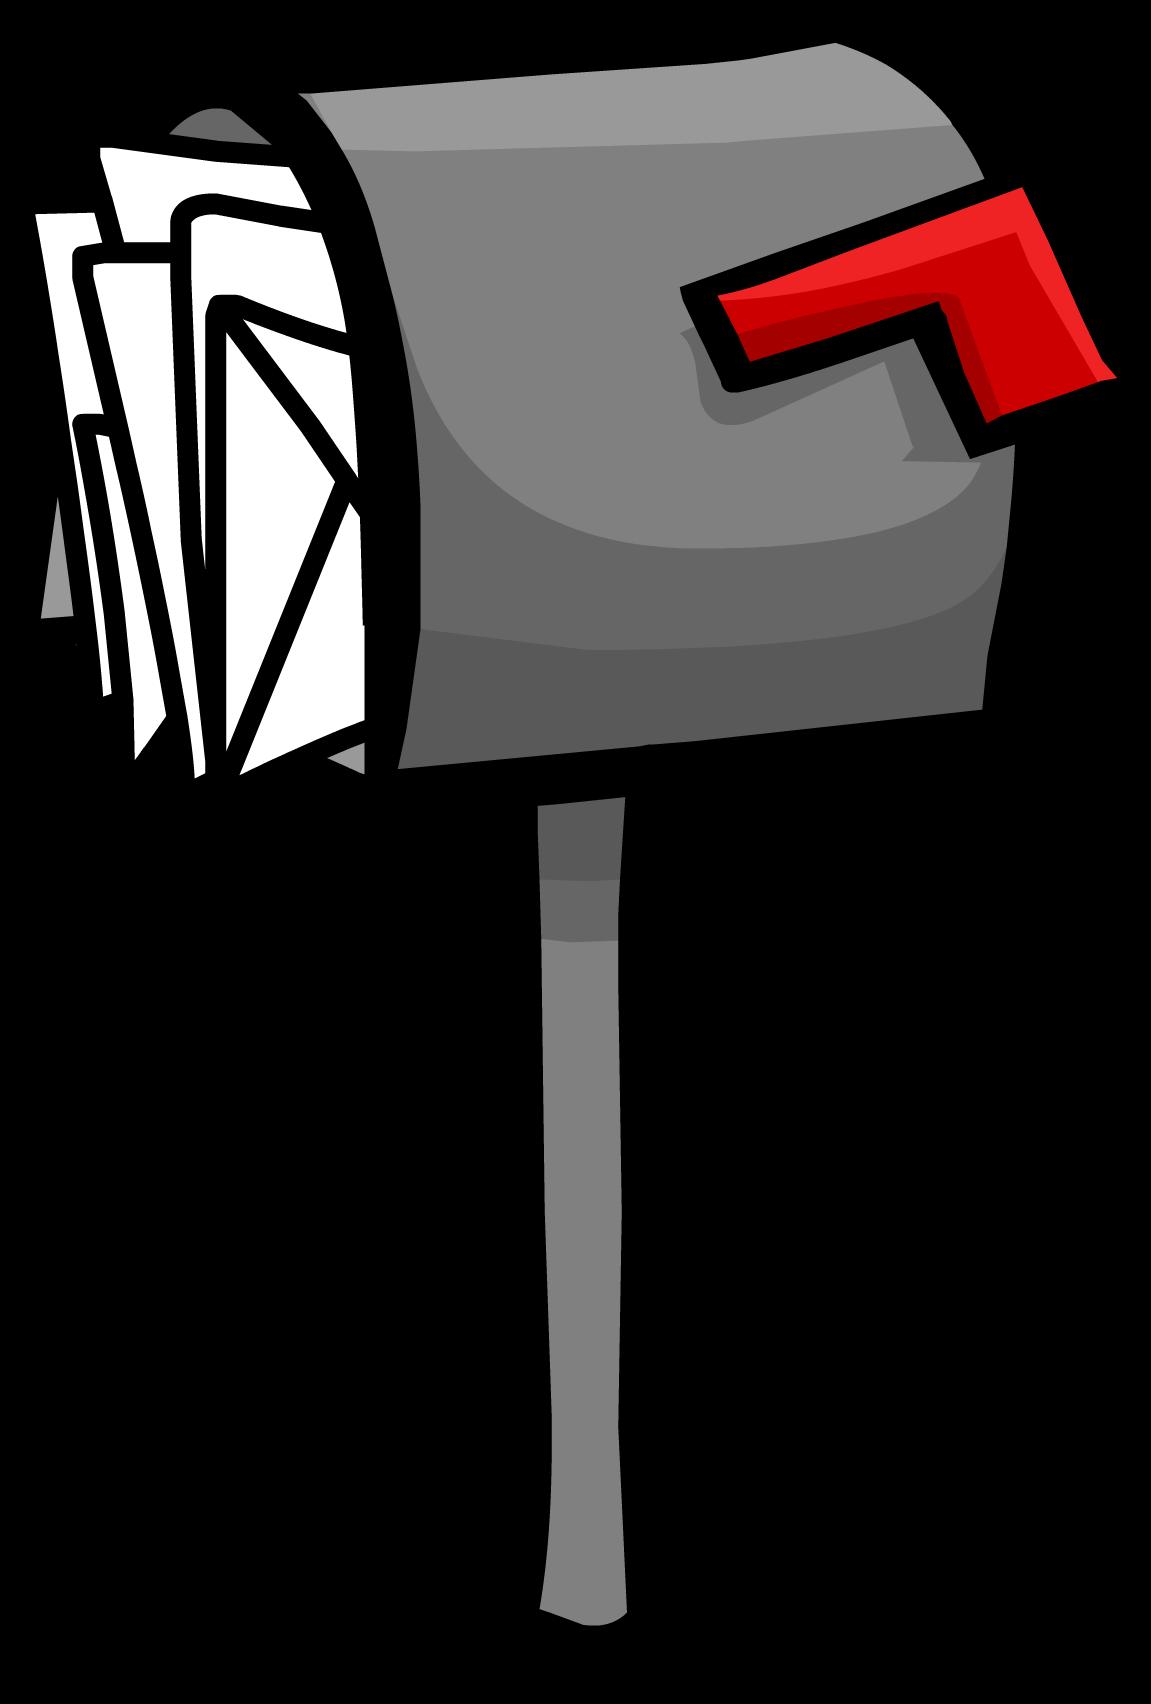 mailbox clipart postal service